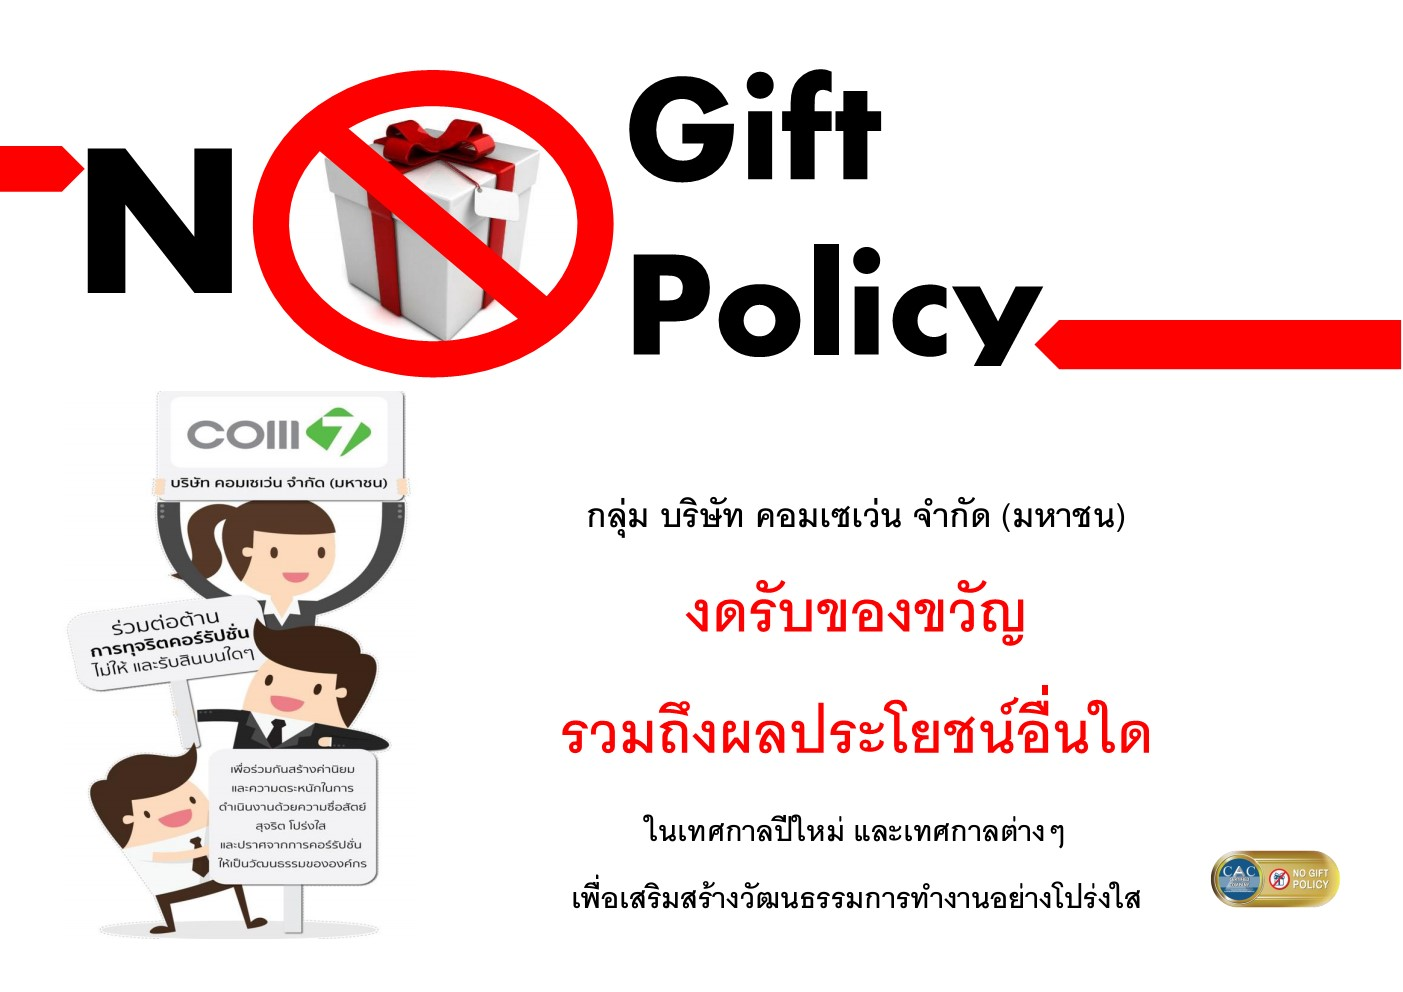 NoGiftPolicy